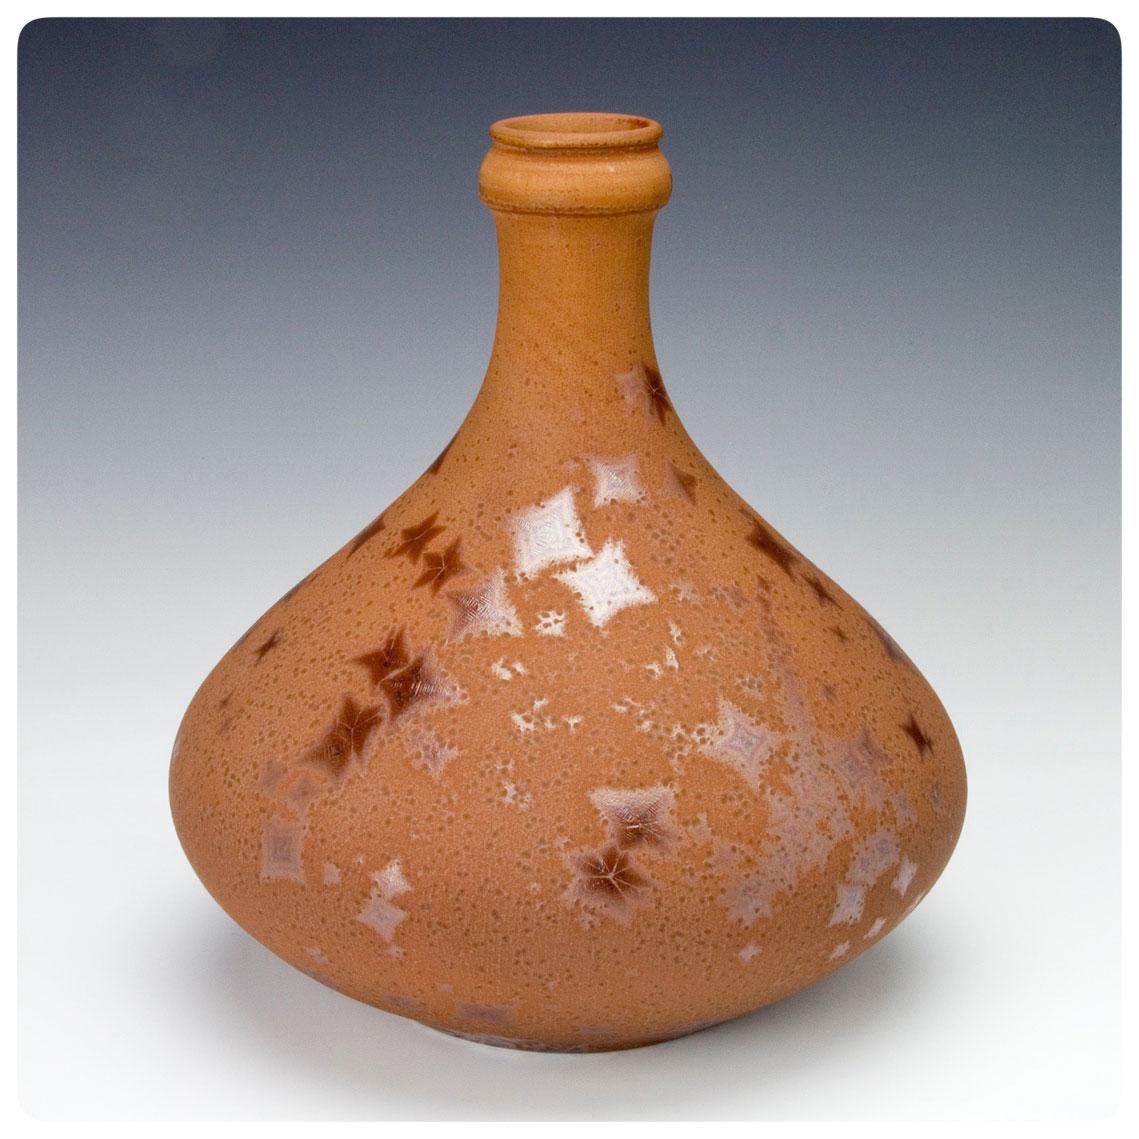 Matte-molybdenum-crystalline-vase-made-by-Bruce-Gholson.jpg